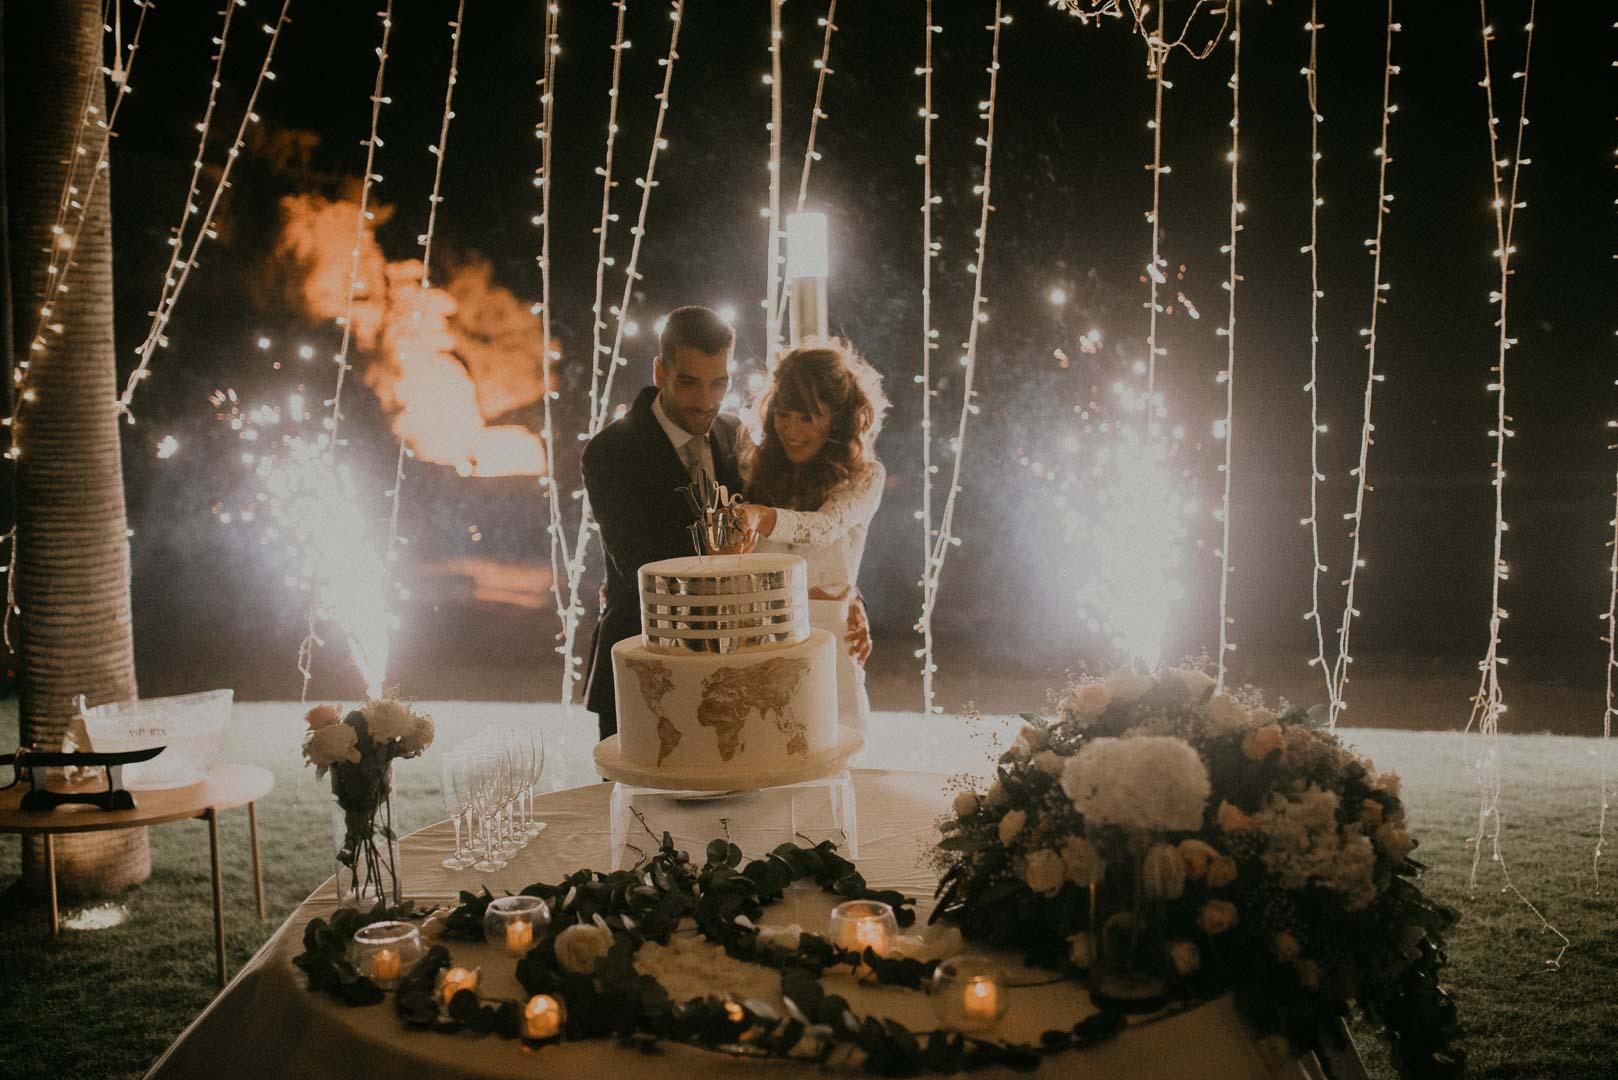 wedding-photographer-destination-fineart-bespoke-reportage-napoli-nabilah-vivianeizzo-spazio46-190